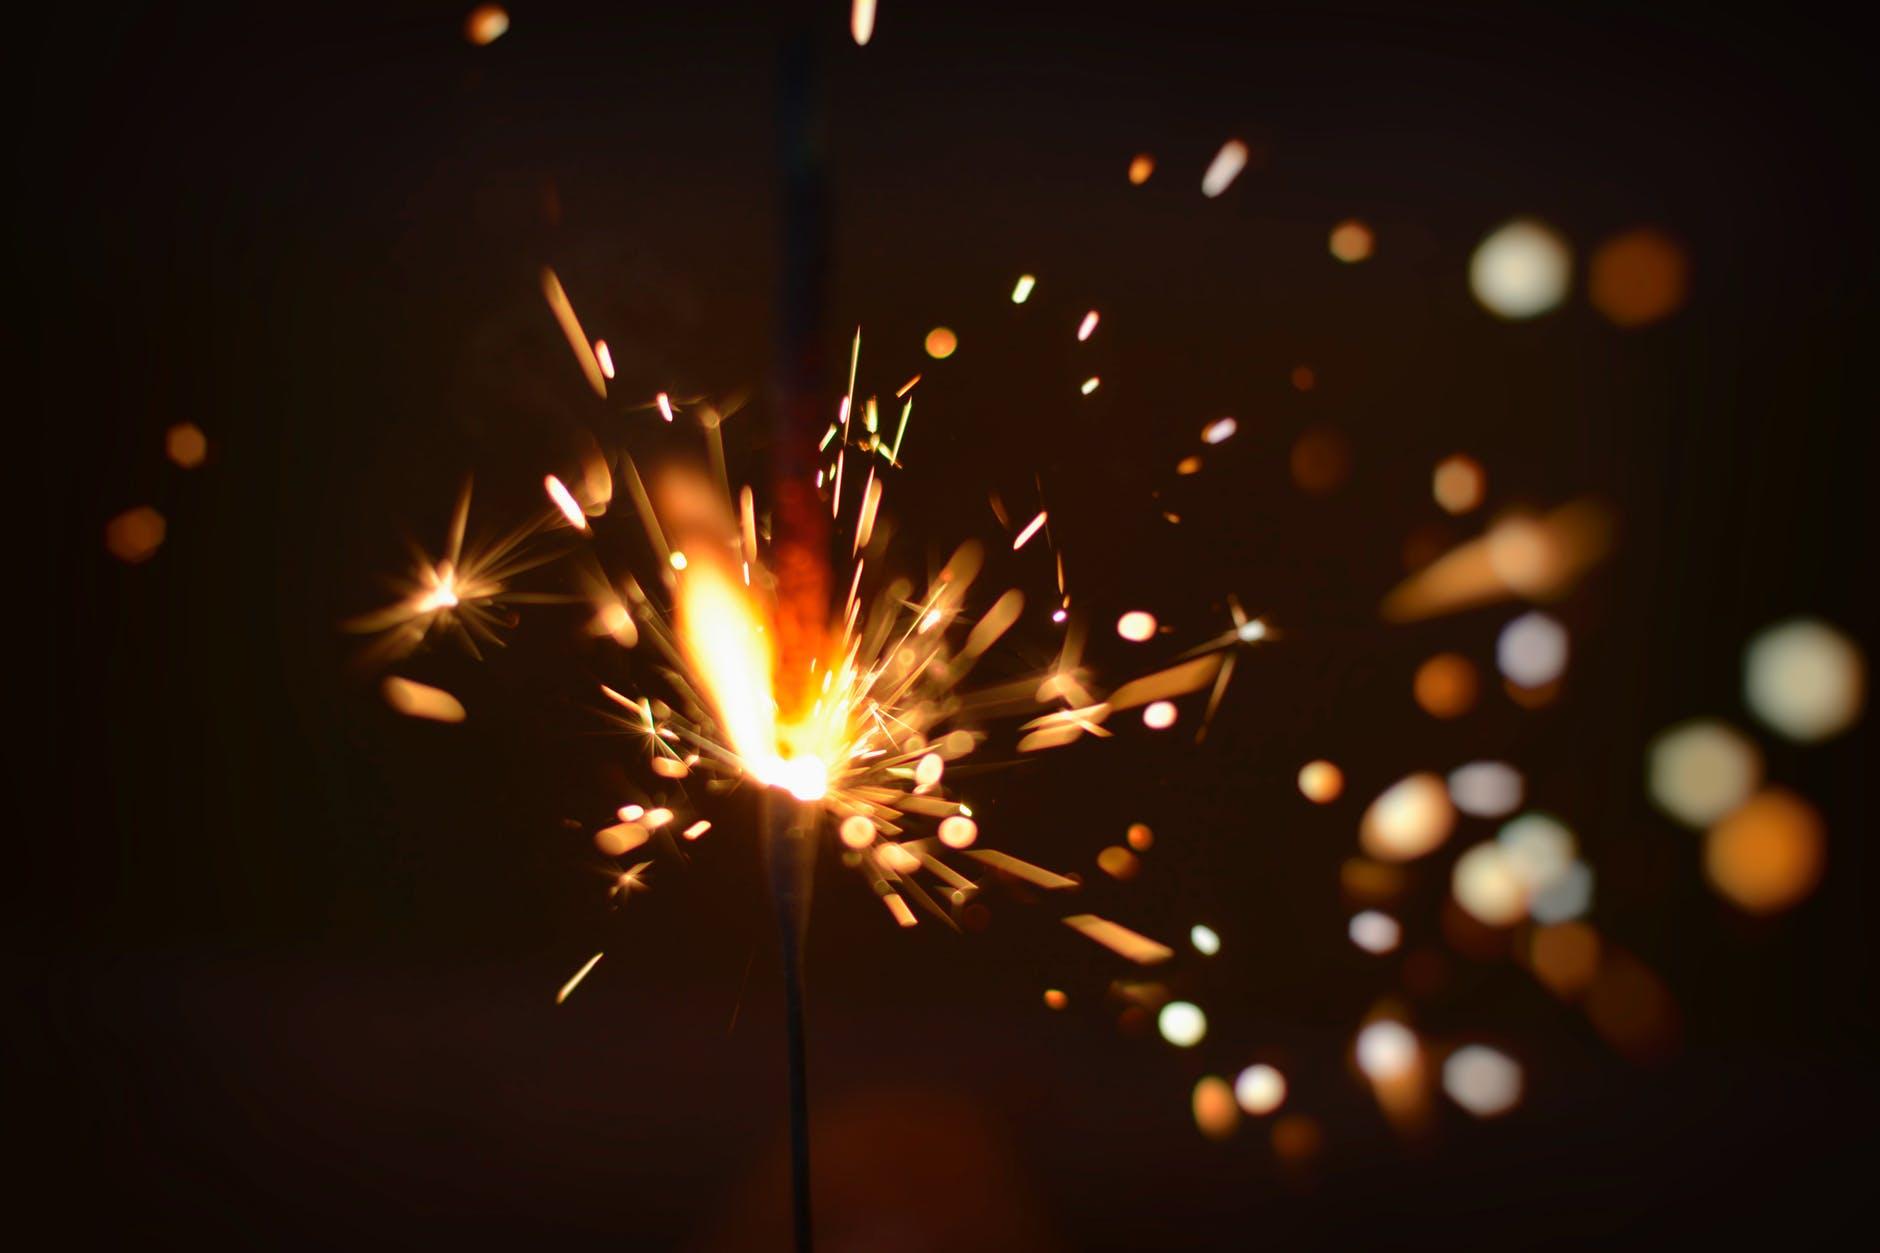 Ernstig vuurwerkongeval - Bovenkarspel | Achtervolging met drankrijder - Hoorn| Overval op woning - Benningbroek